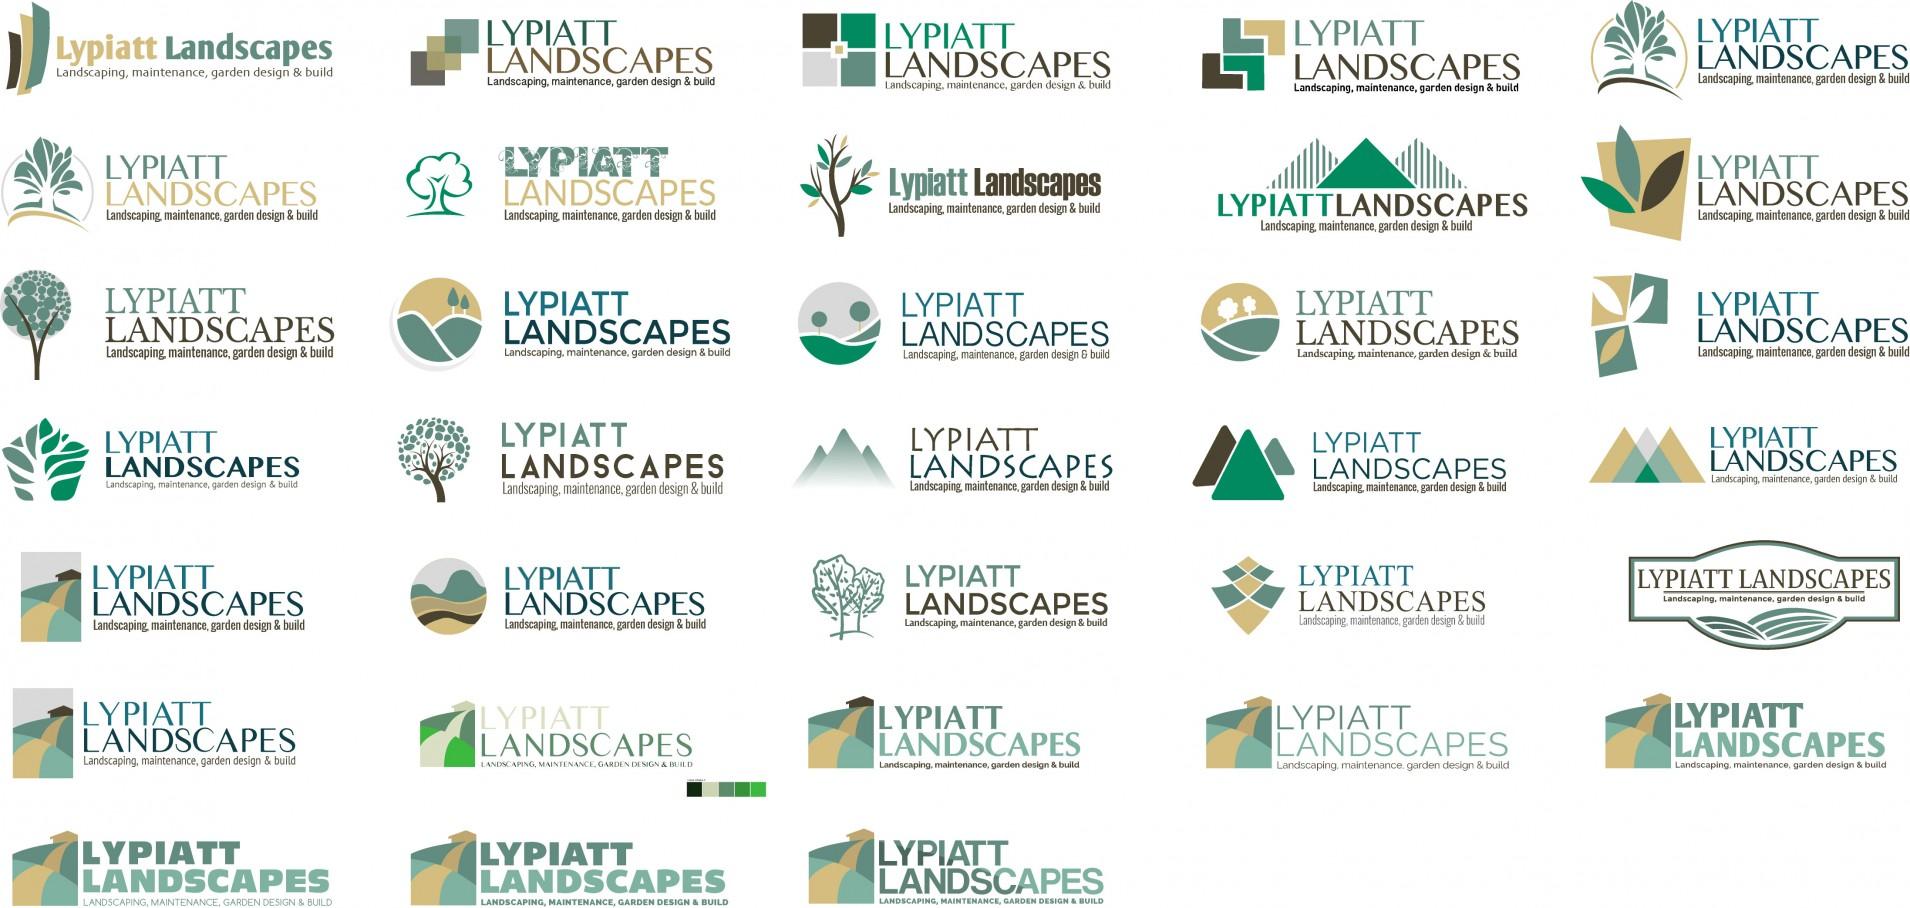 LLA logov1 - Branding & web design for landscape gardening company